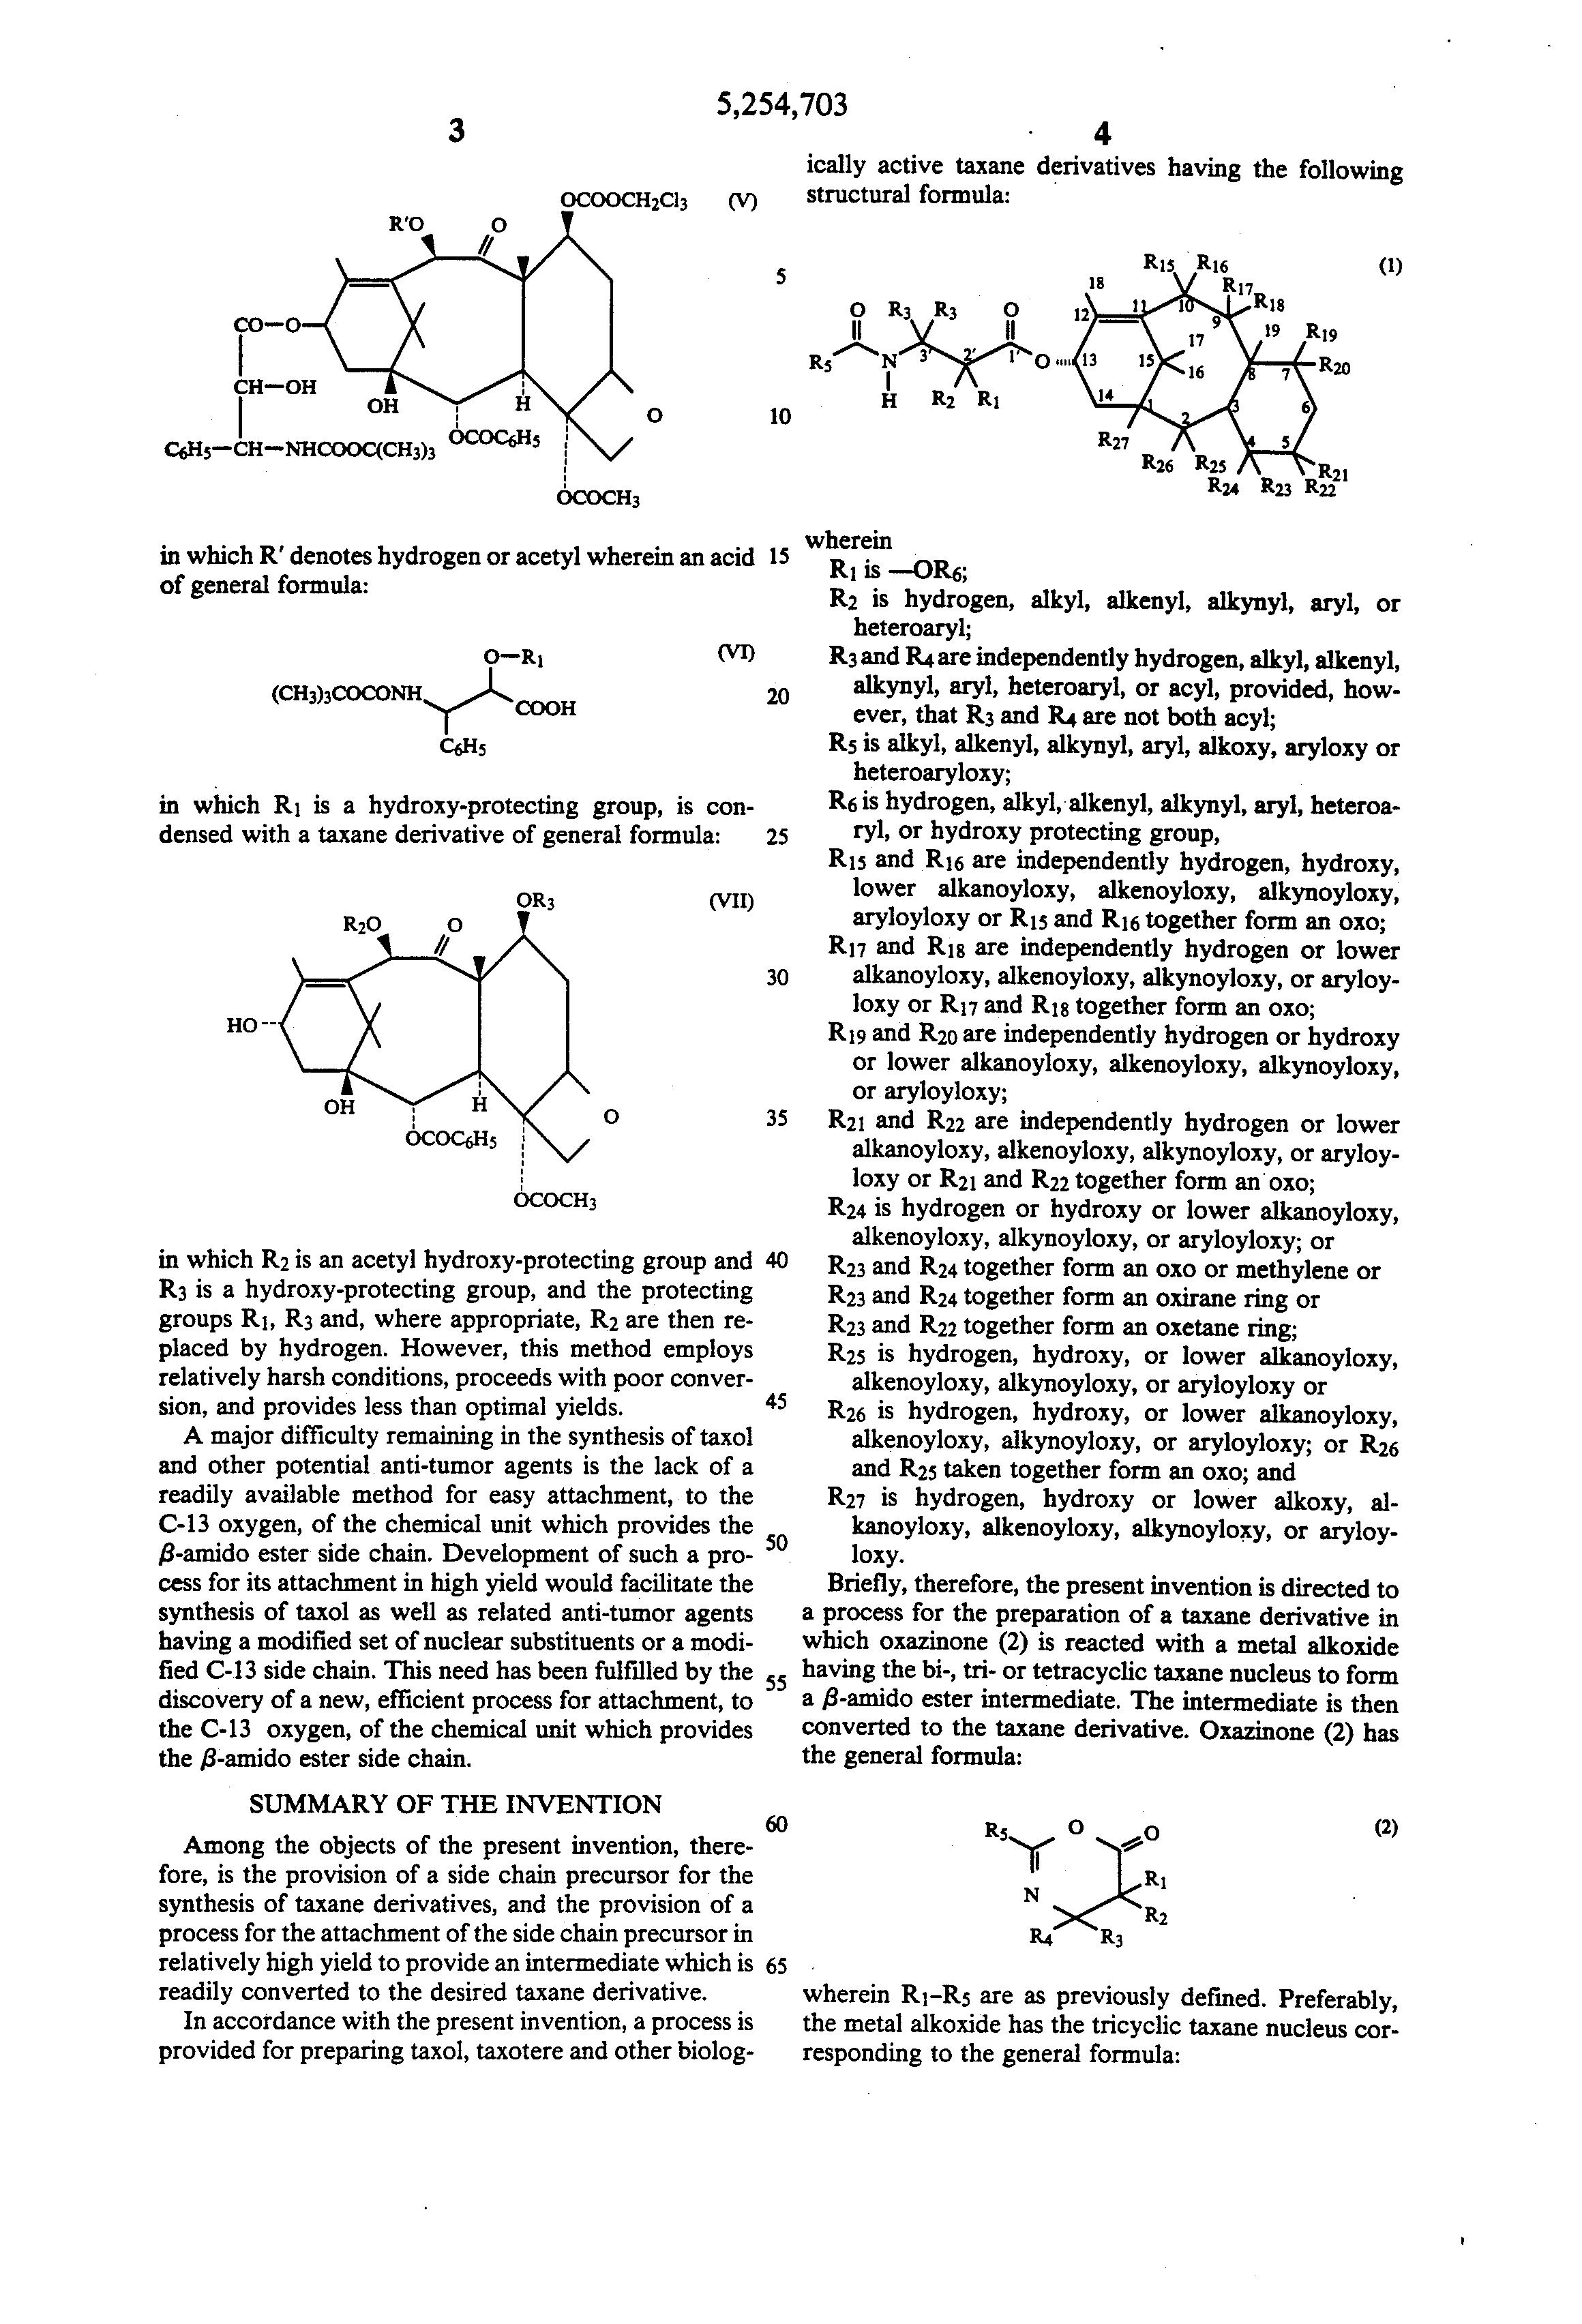 holton semisynthesis of taxol